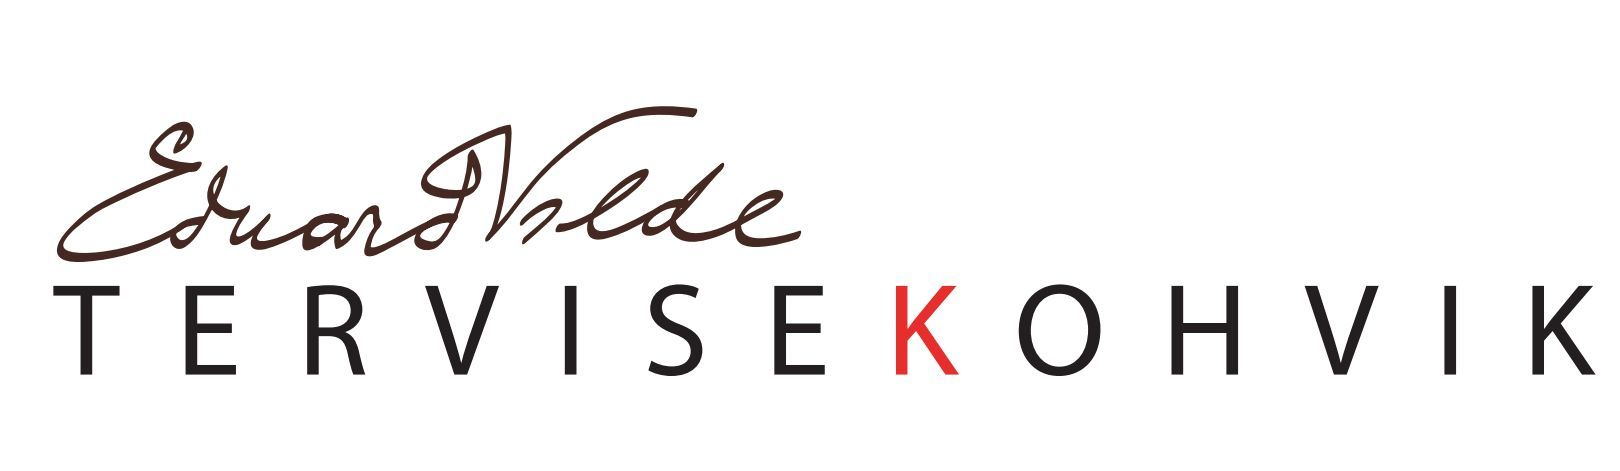 vilde tervisekohviku logo